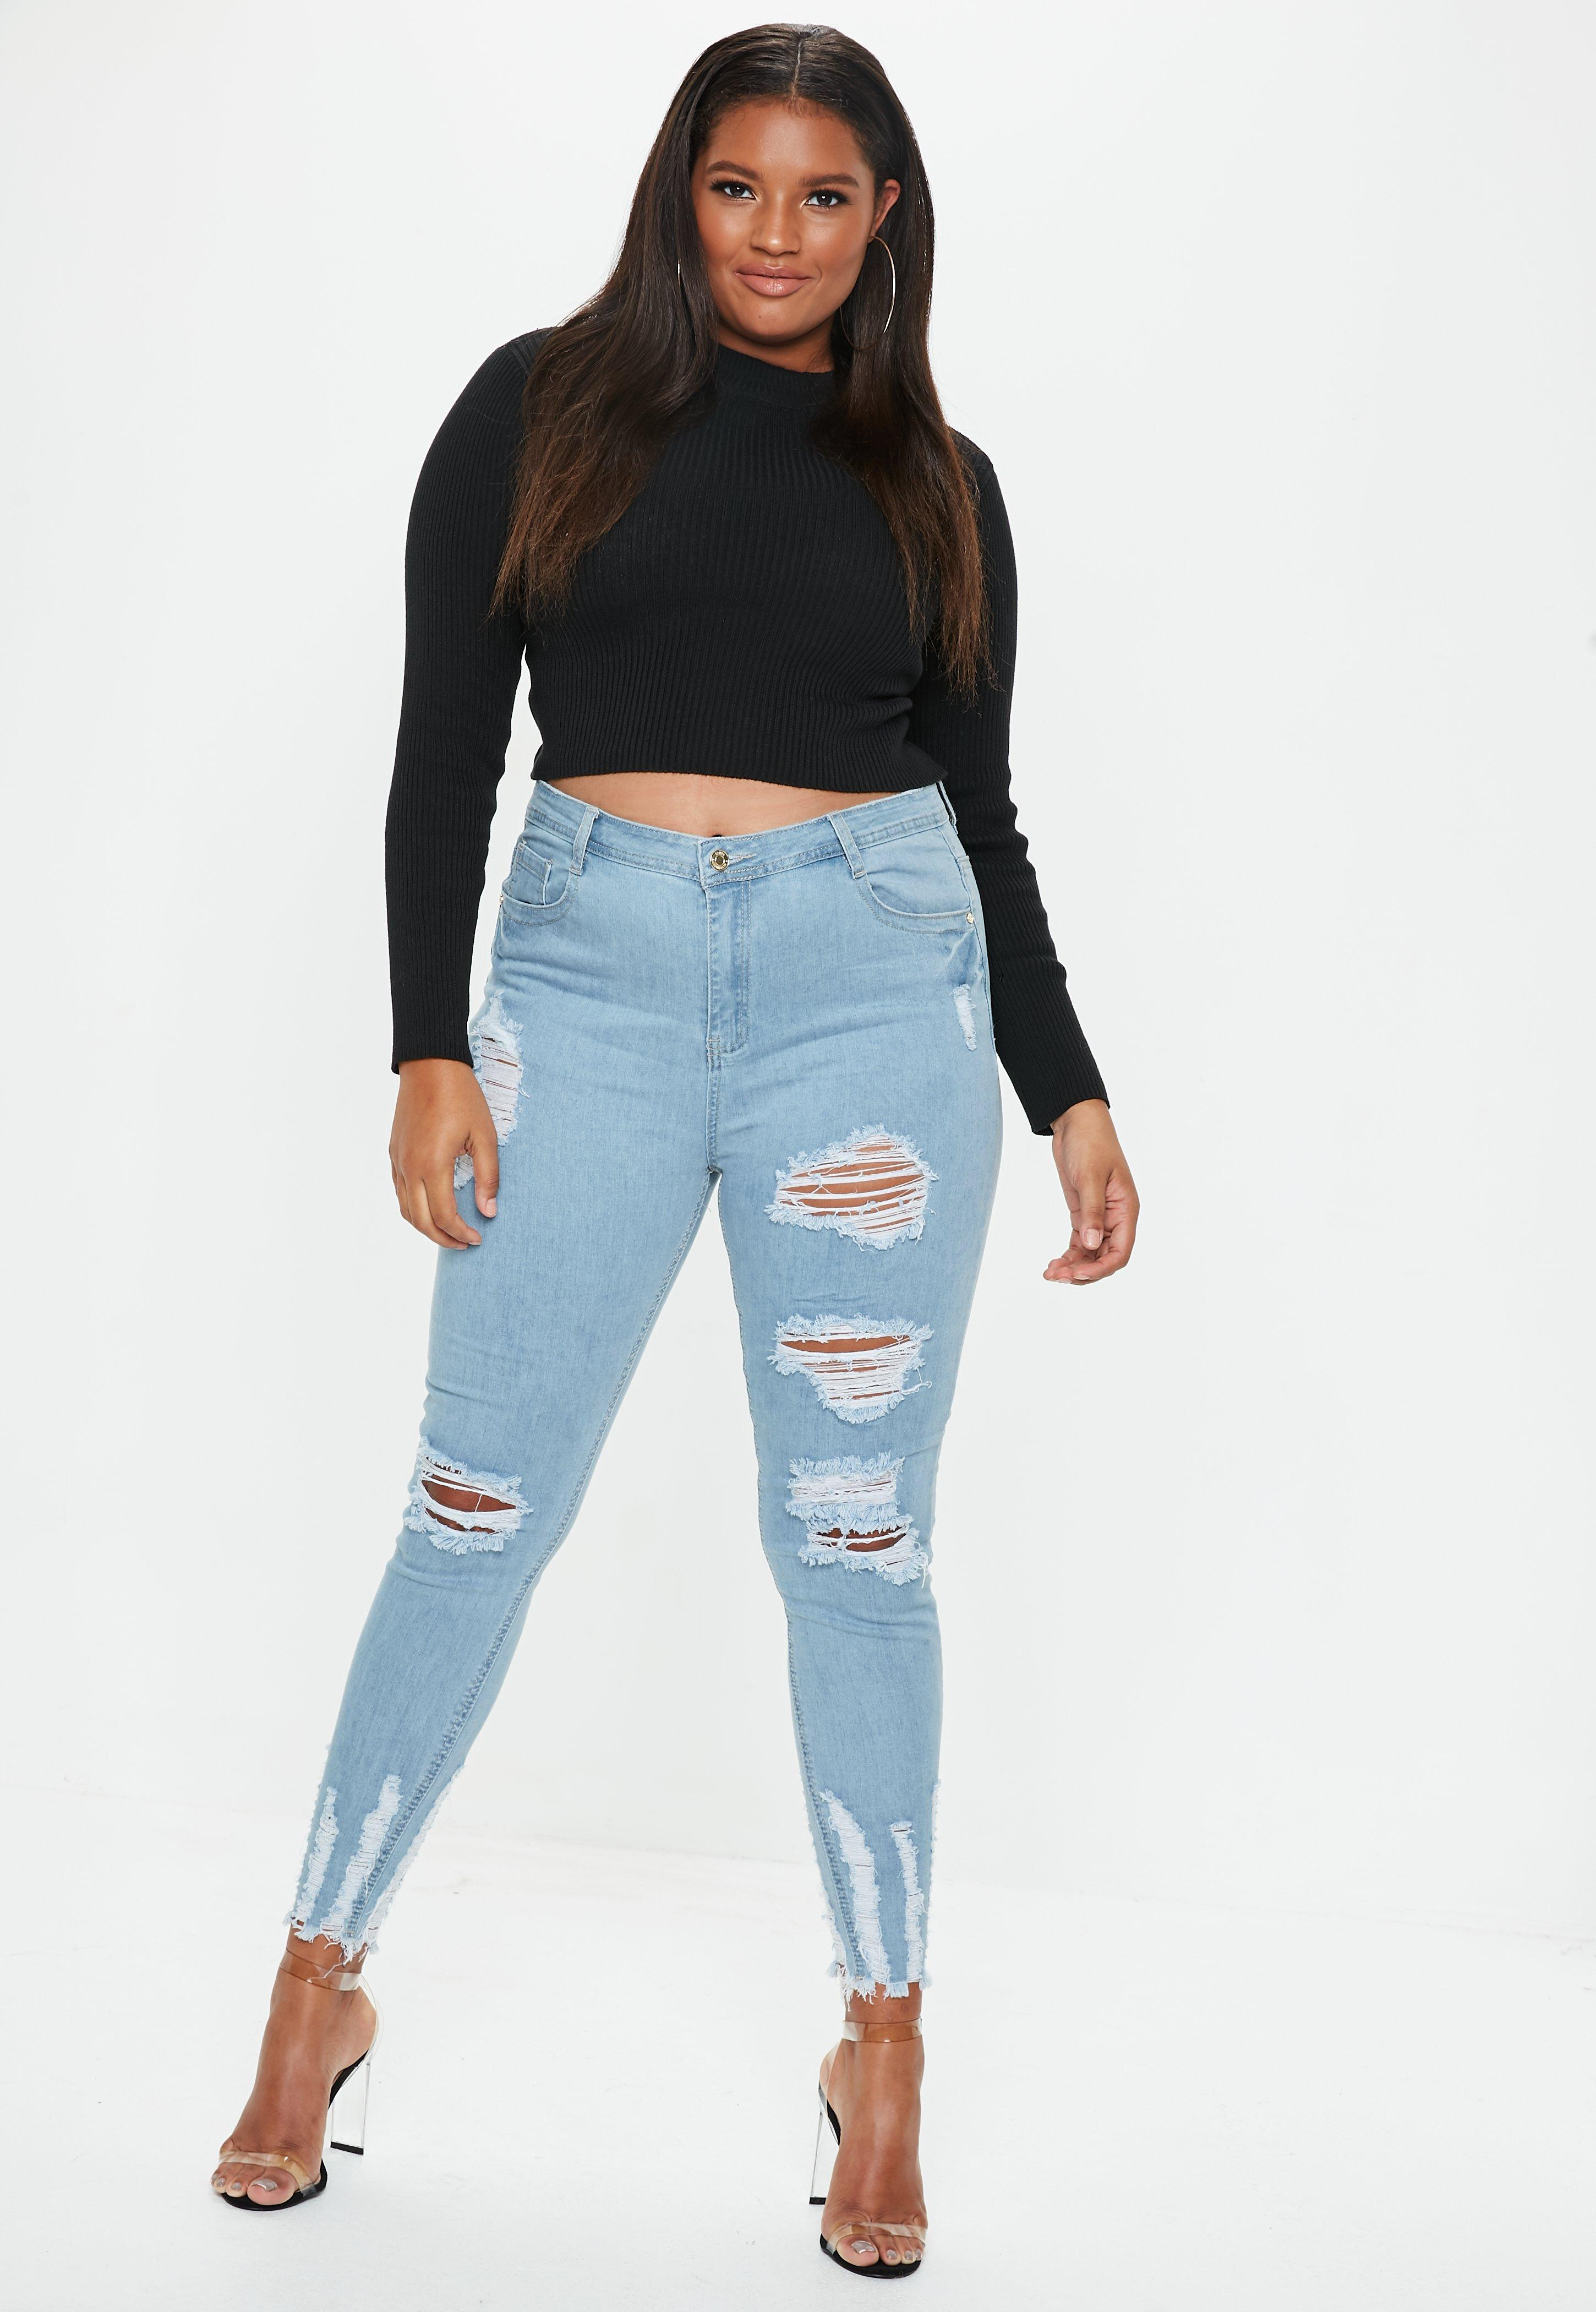 e030ce5714 Plus Size Clothing